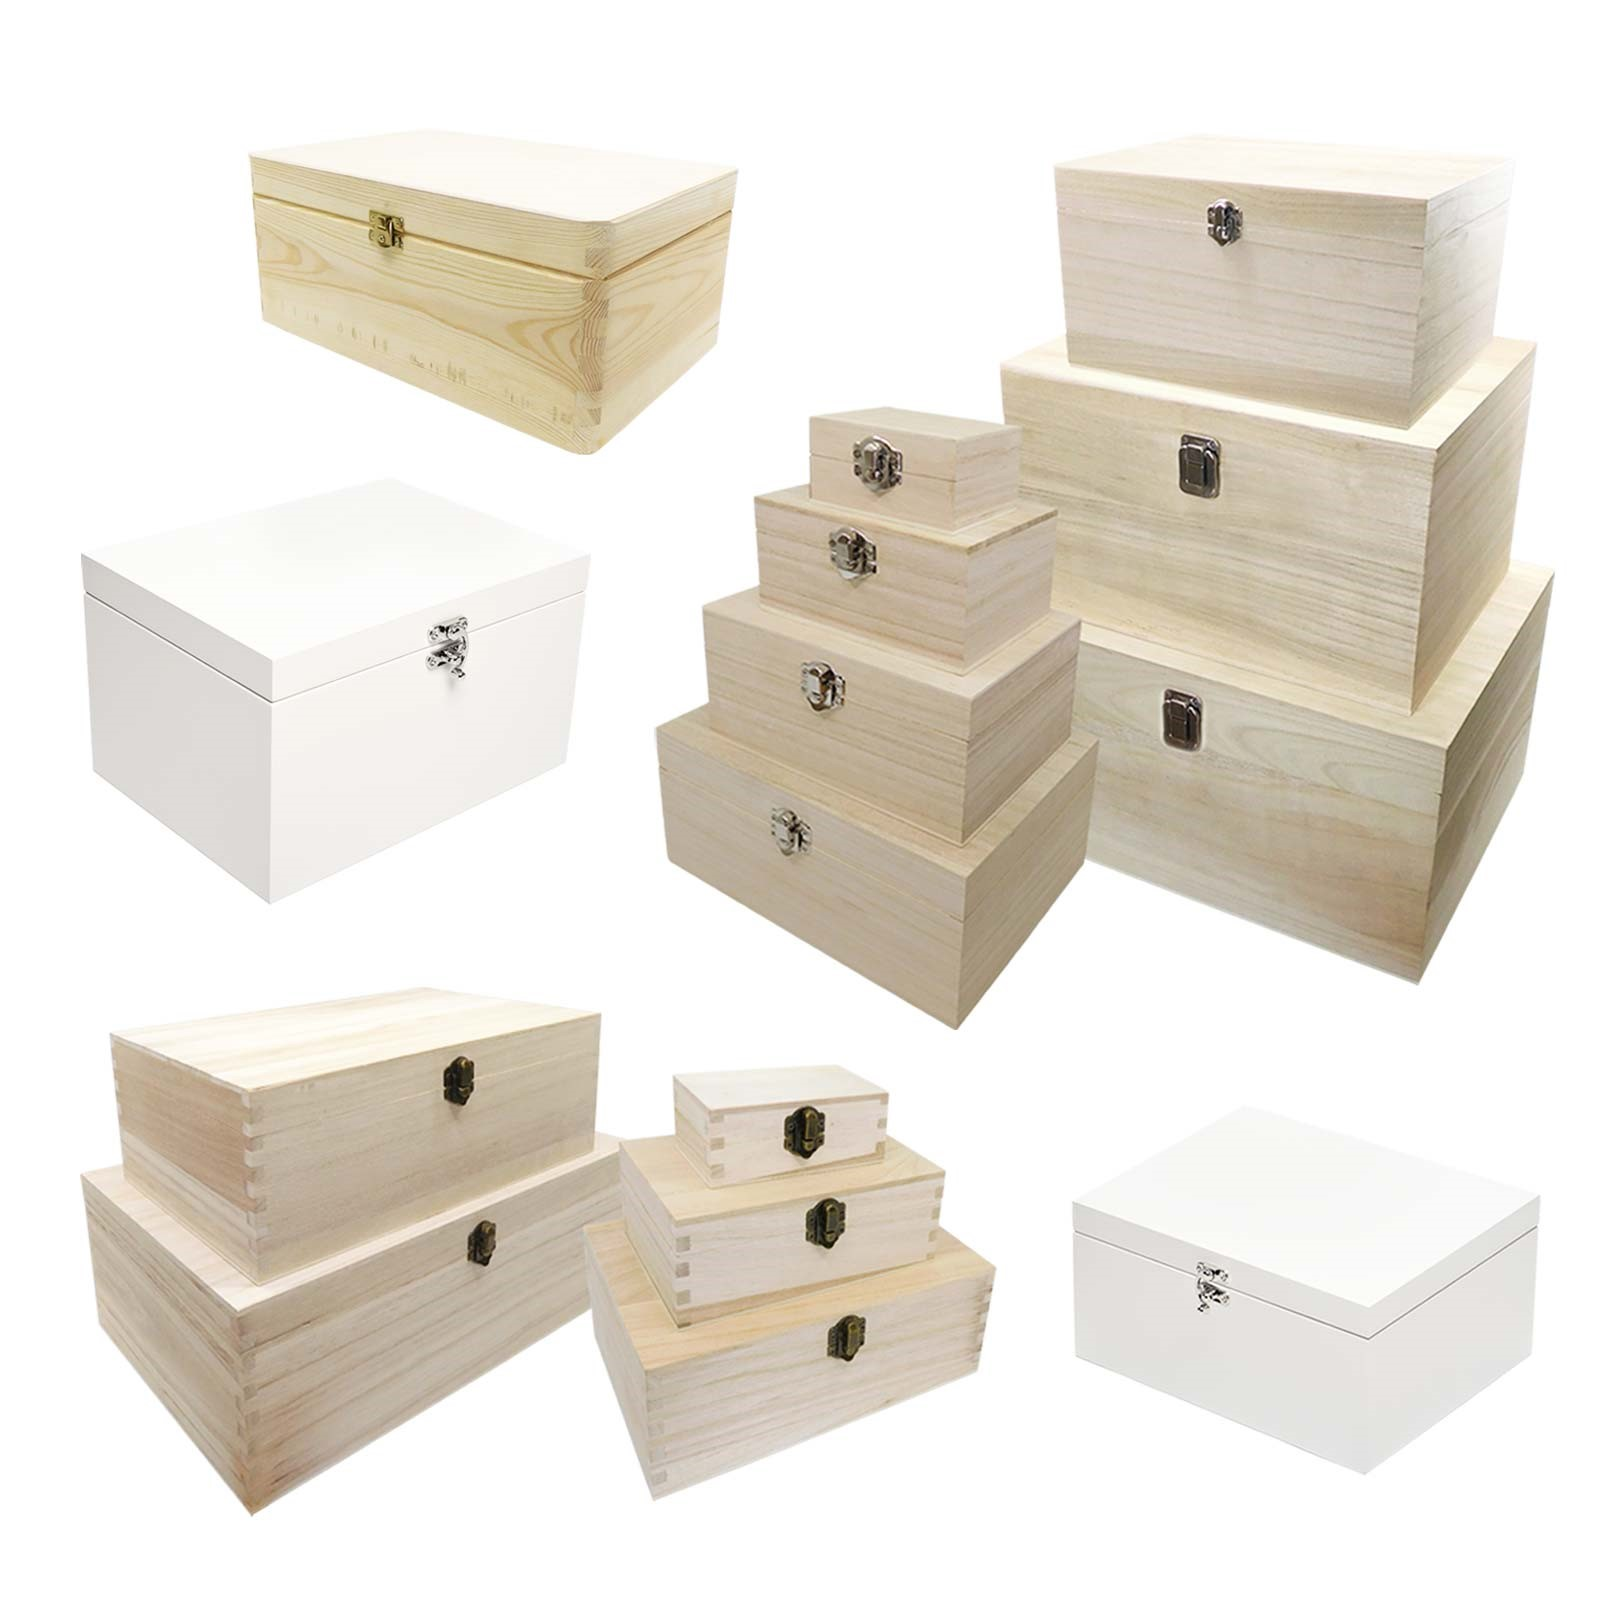 Bare Wood Storage Box 27cm x 16cm x 5cm